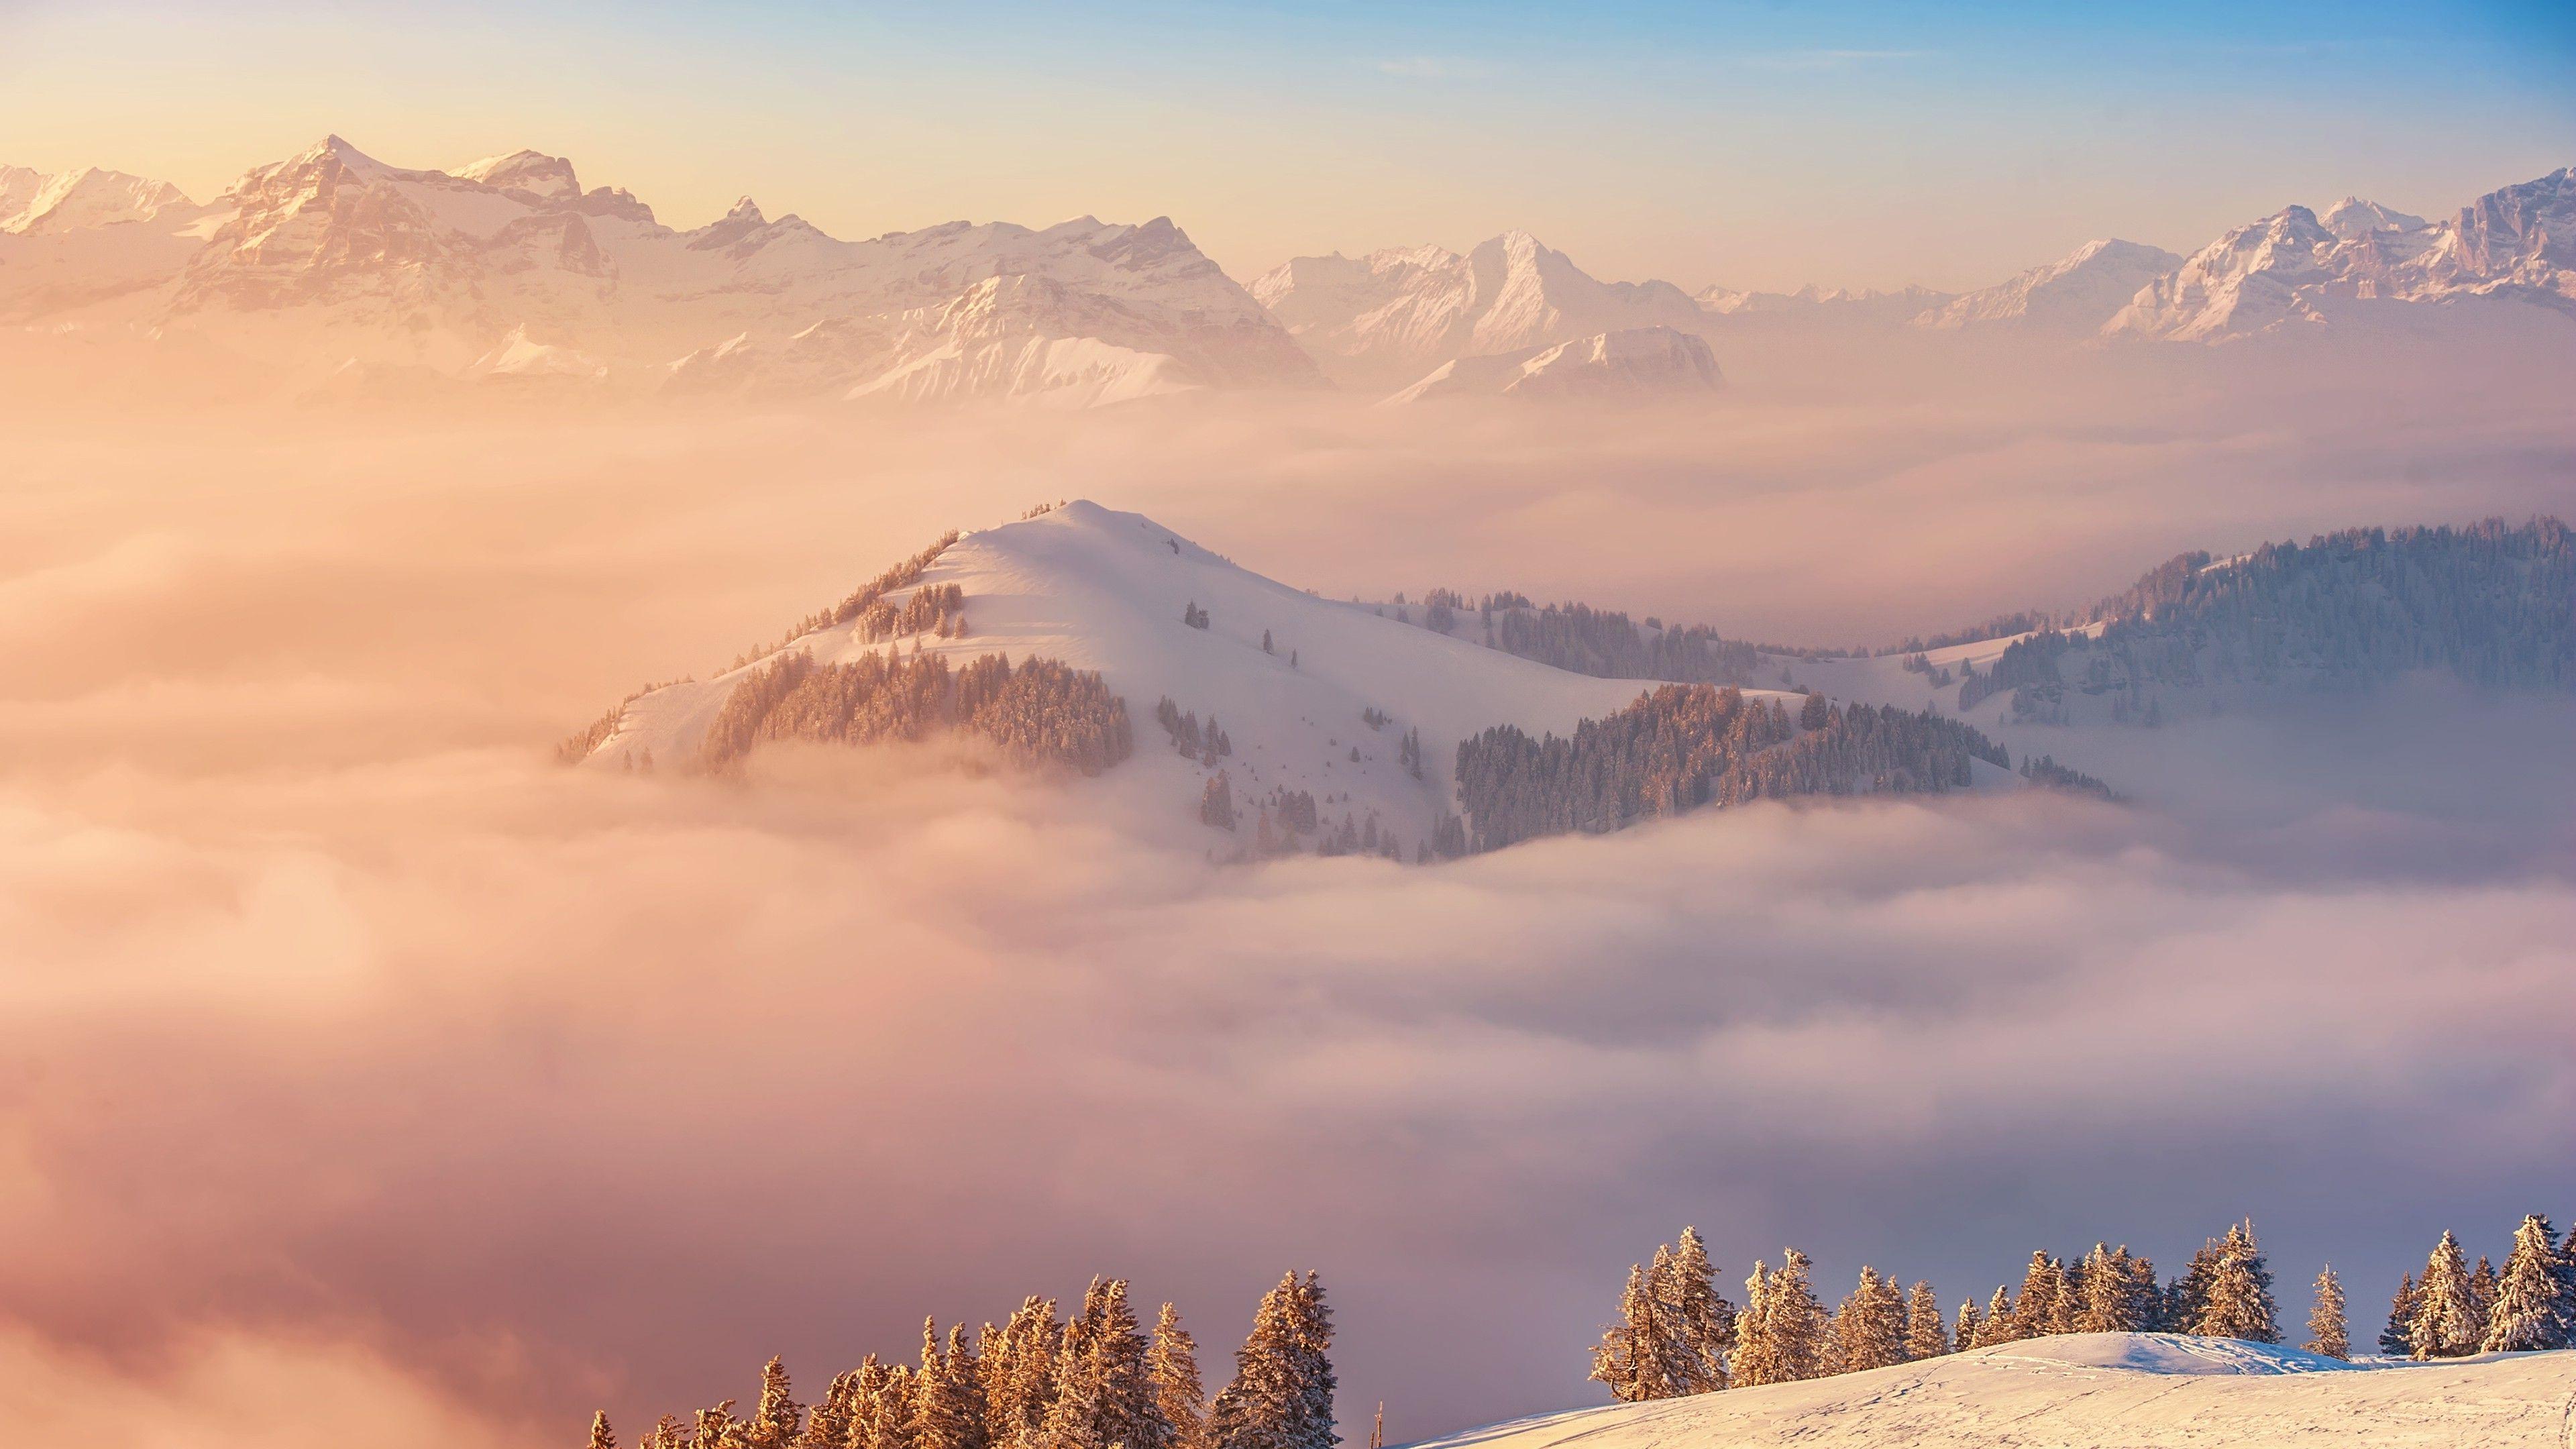 3840x2160 Landscape Mist Snow Trap Nation Demon Wallpapers Hd Desktop And Mobile Backgrounds Nature Wallpaper Switzerland Mountains Mountain Wallpaper